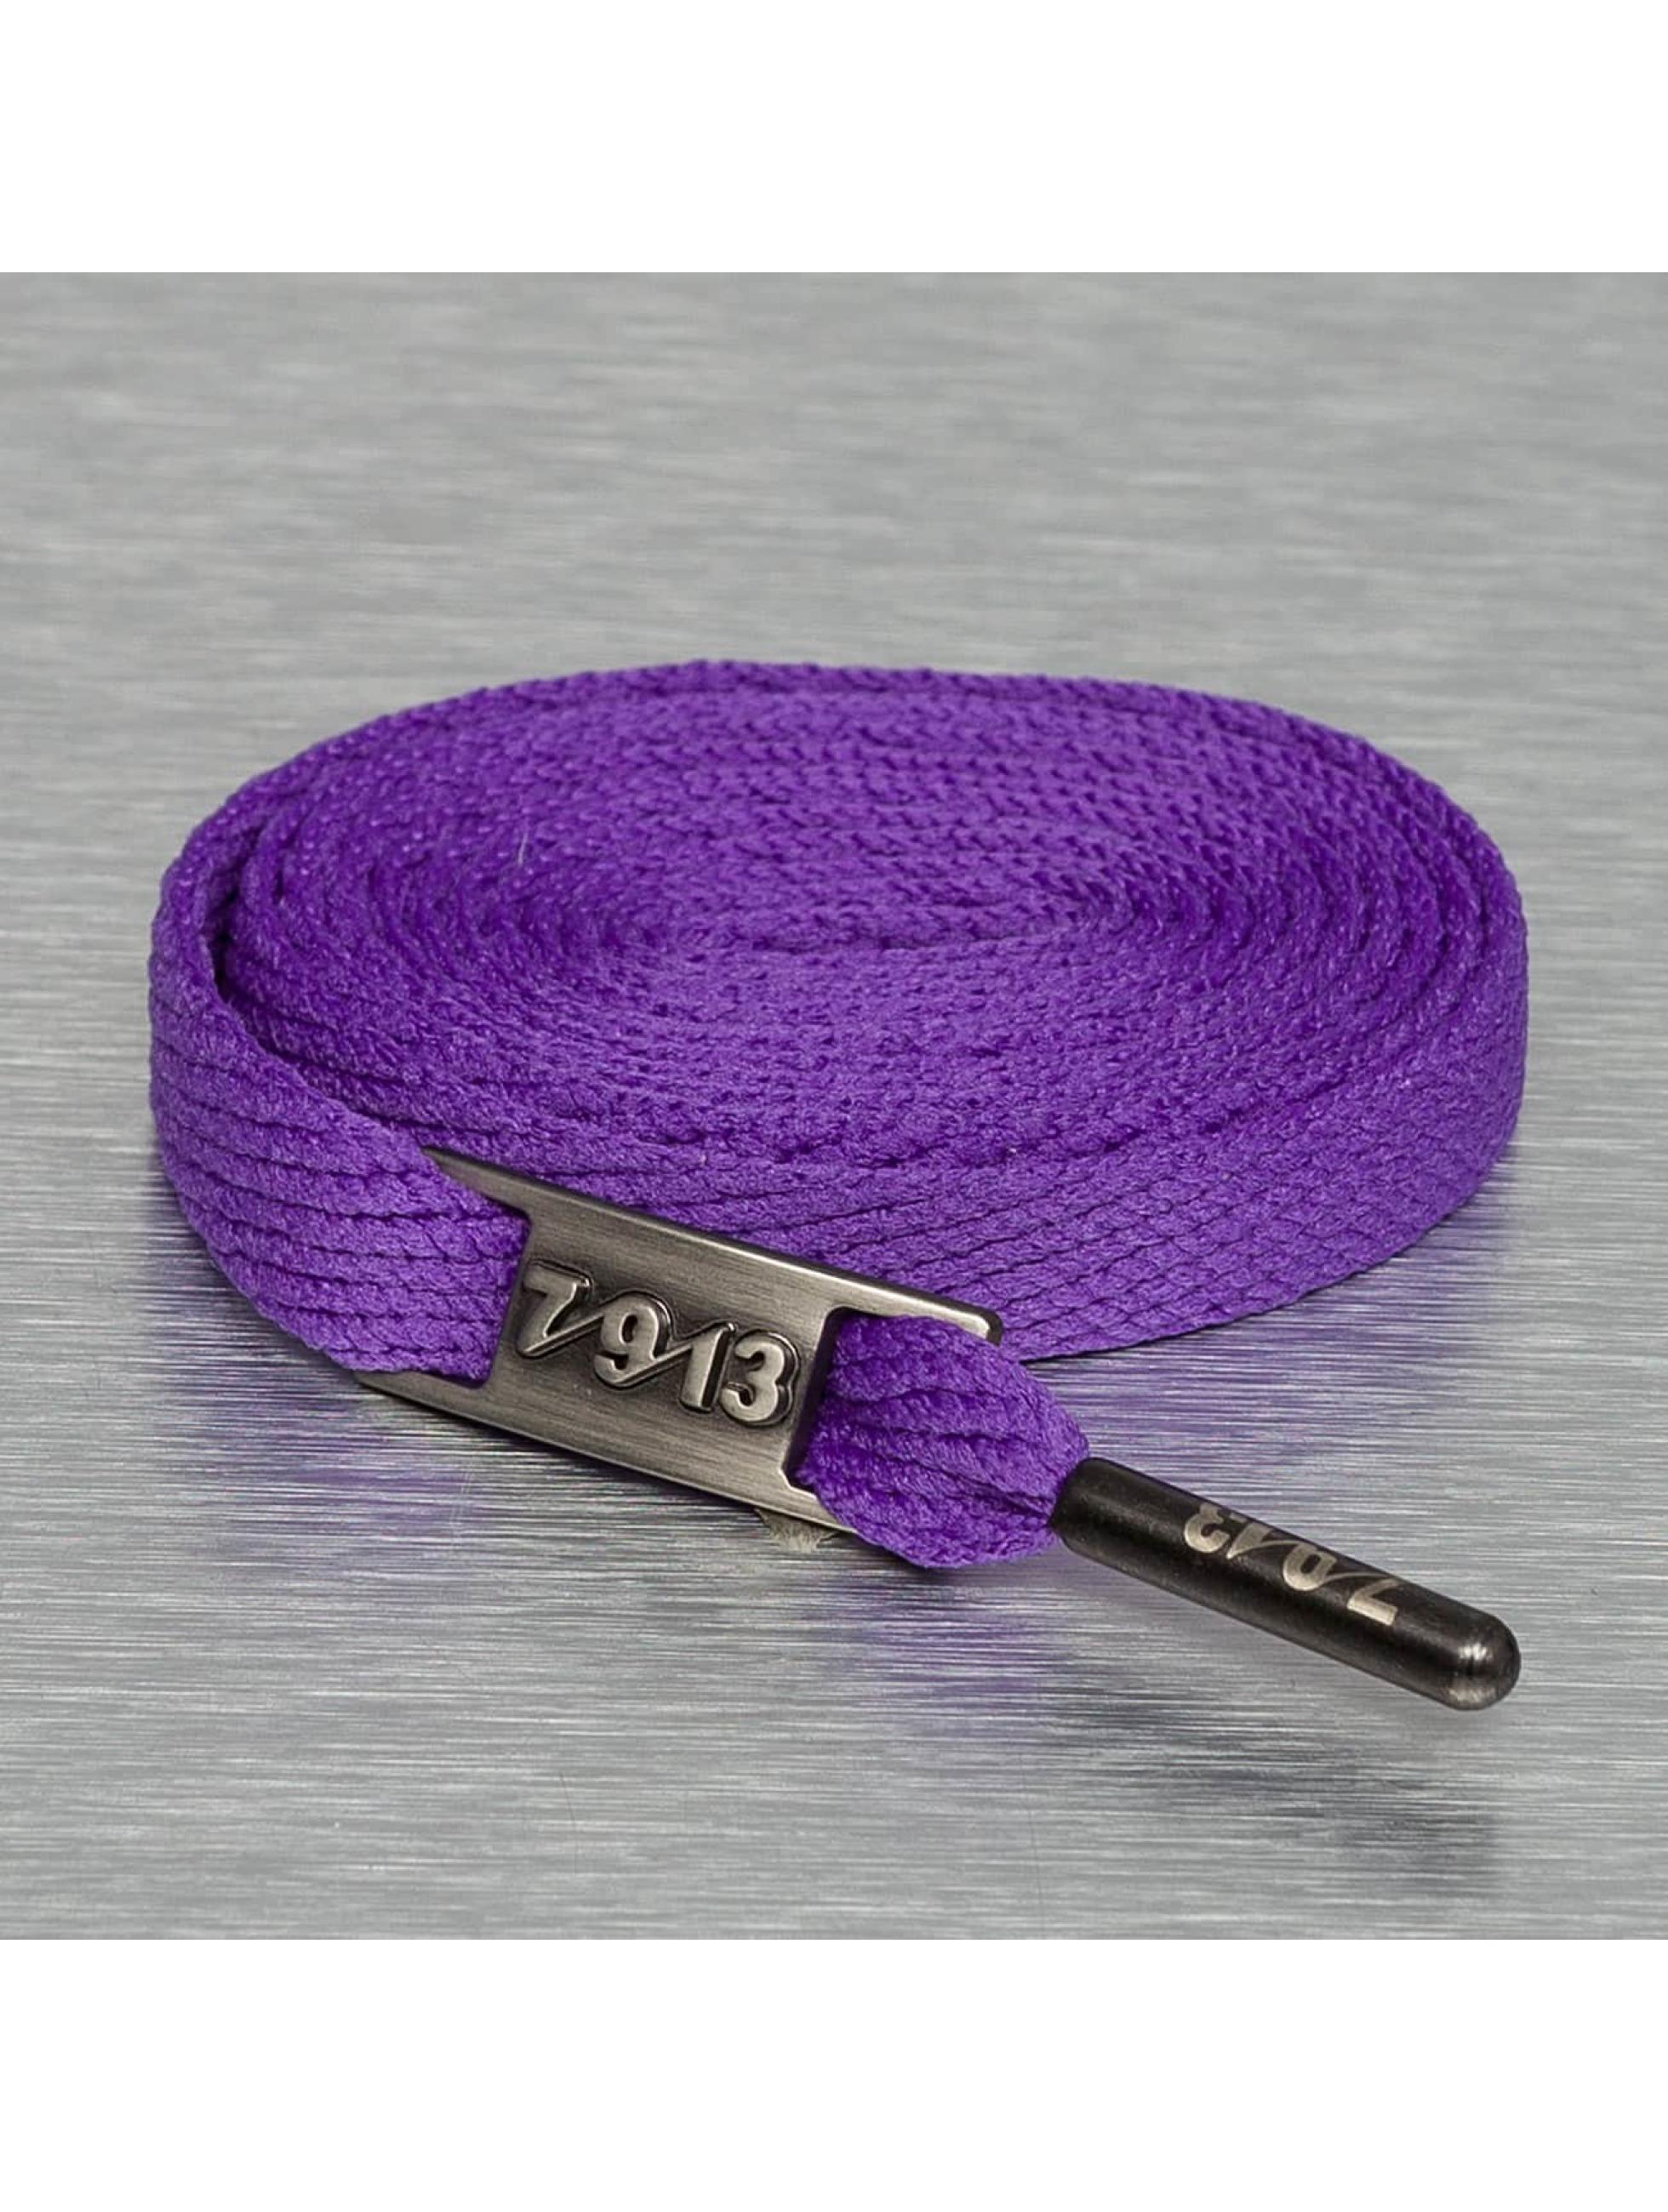 Seven Nine 13 Kengännauhat Full Metal purpuranpunainen